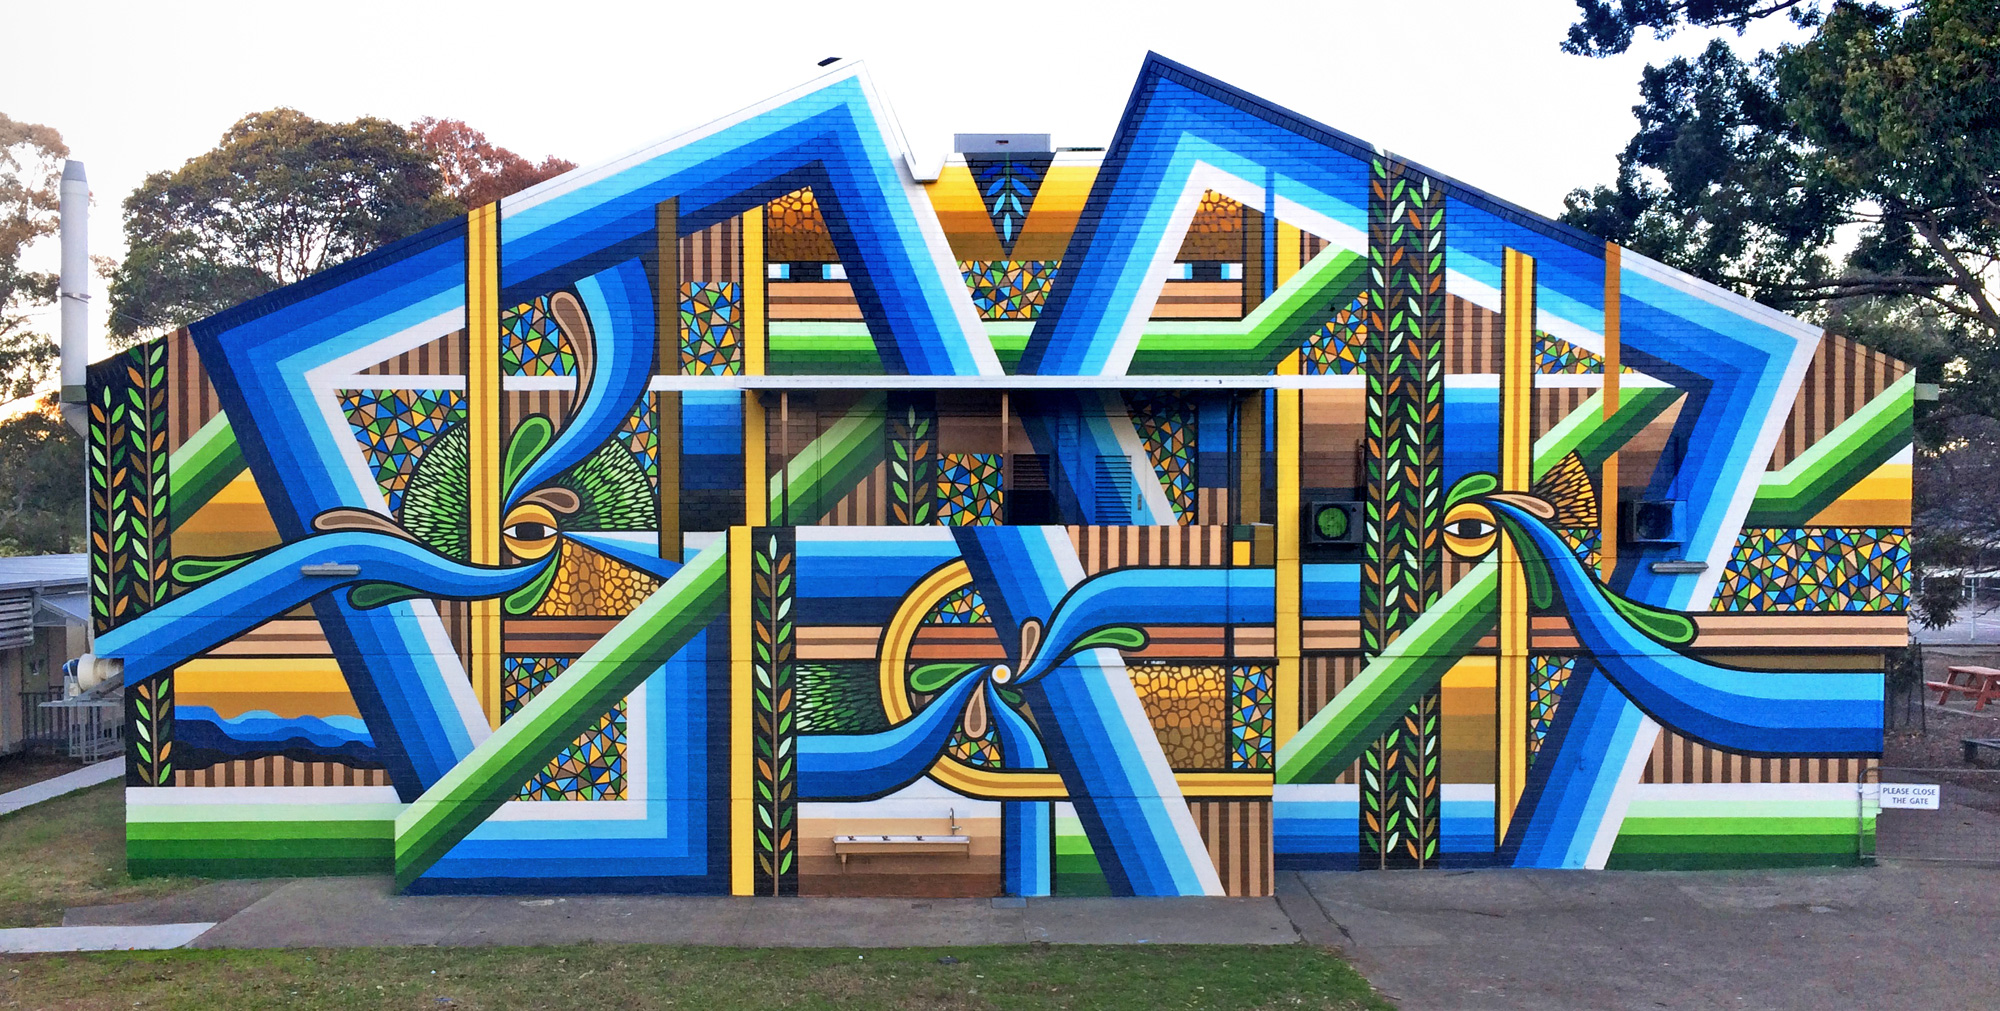 NEPEAN CREATIVE & PERFORMING ARTS SCHOOL, NSW AUSTRALIA